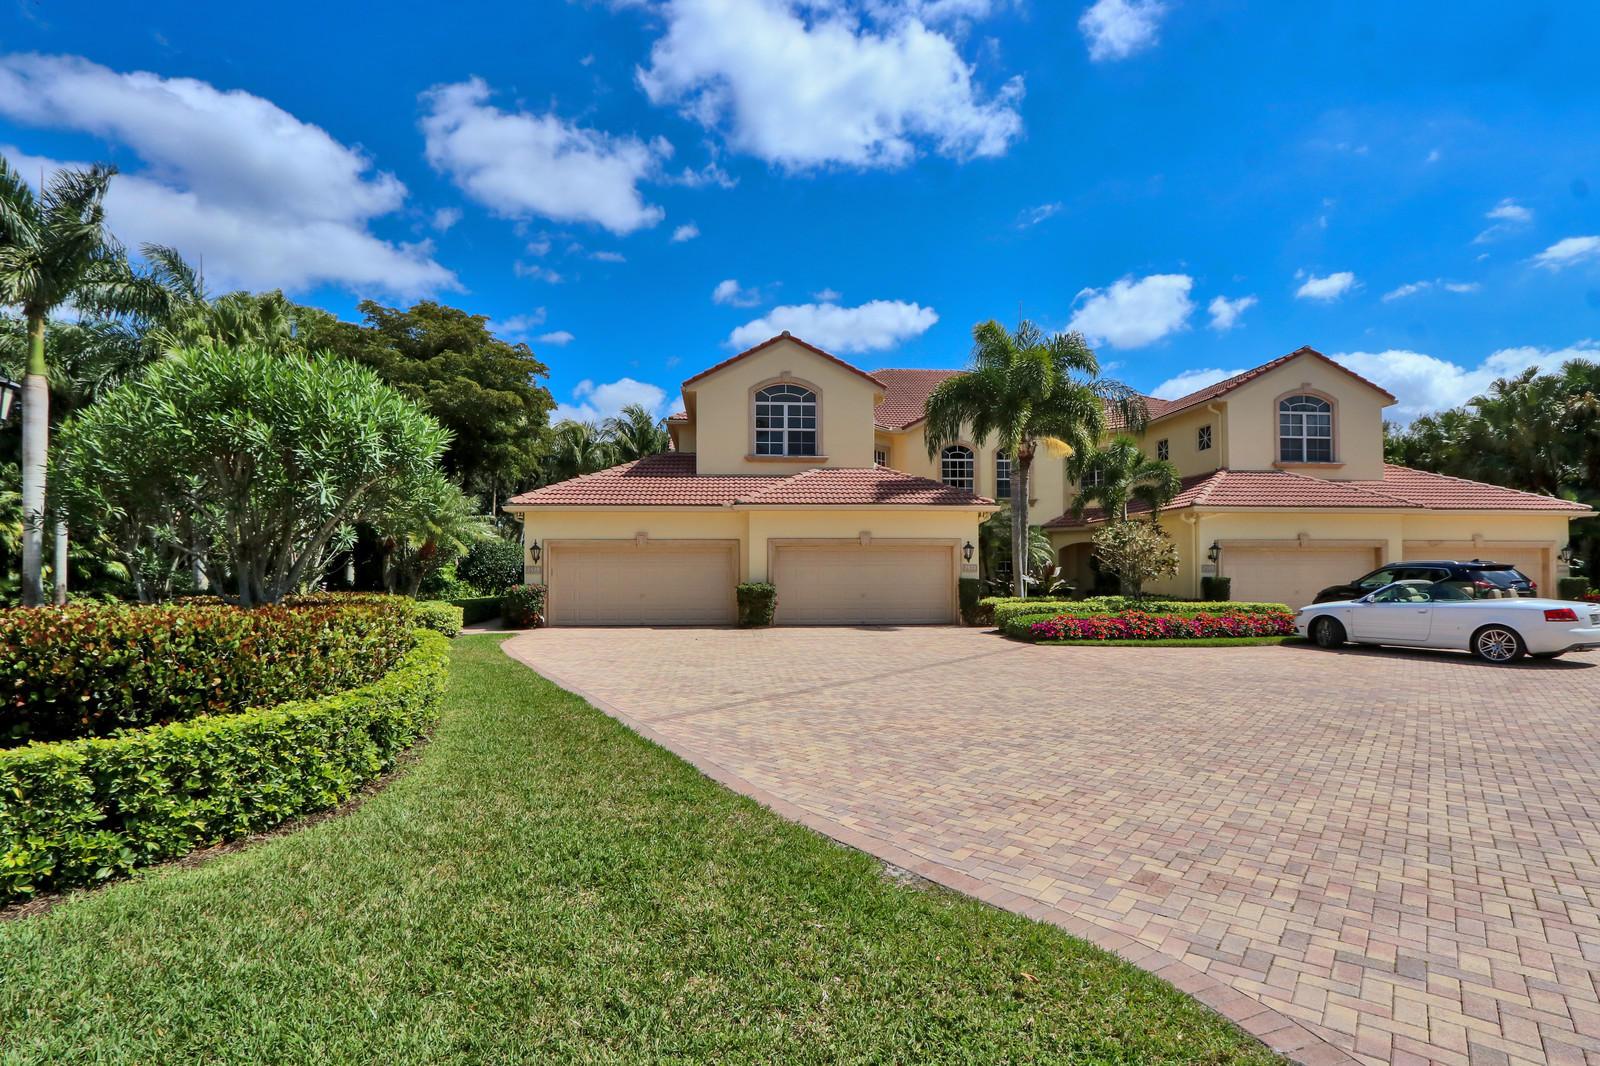 7576 Orchid Hammock Drive, West Palm Beach, Florida 33412, 3 Bedrooms Bedrooms, ,3 BathroomsBathrooms,A,Condominium,Orchid Hammock,RX-10606871